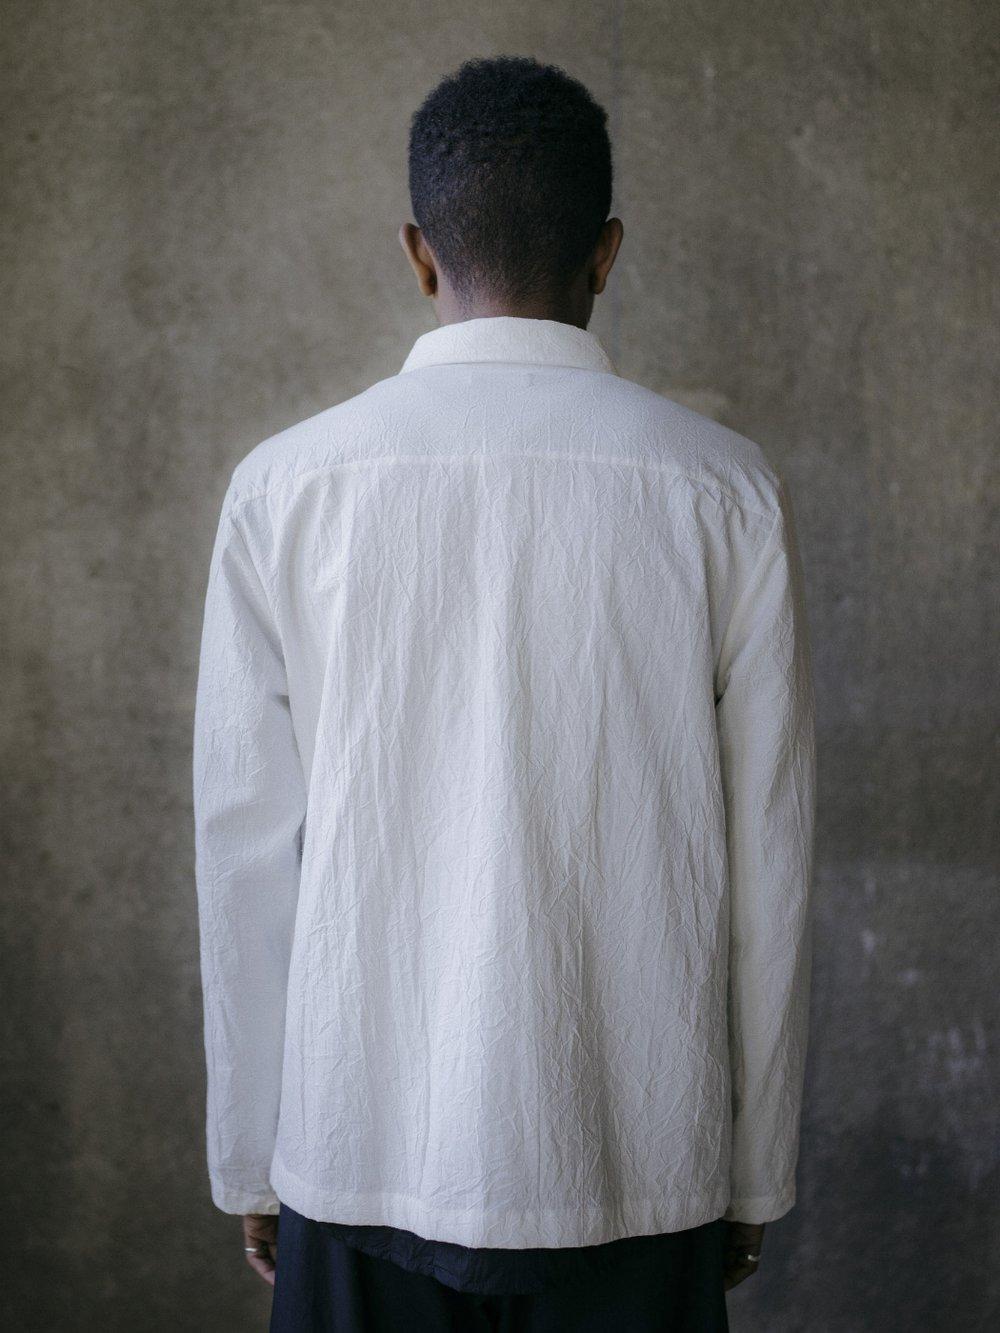 evan-kinori-field-shirt-crinkle-cotton-4